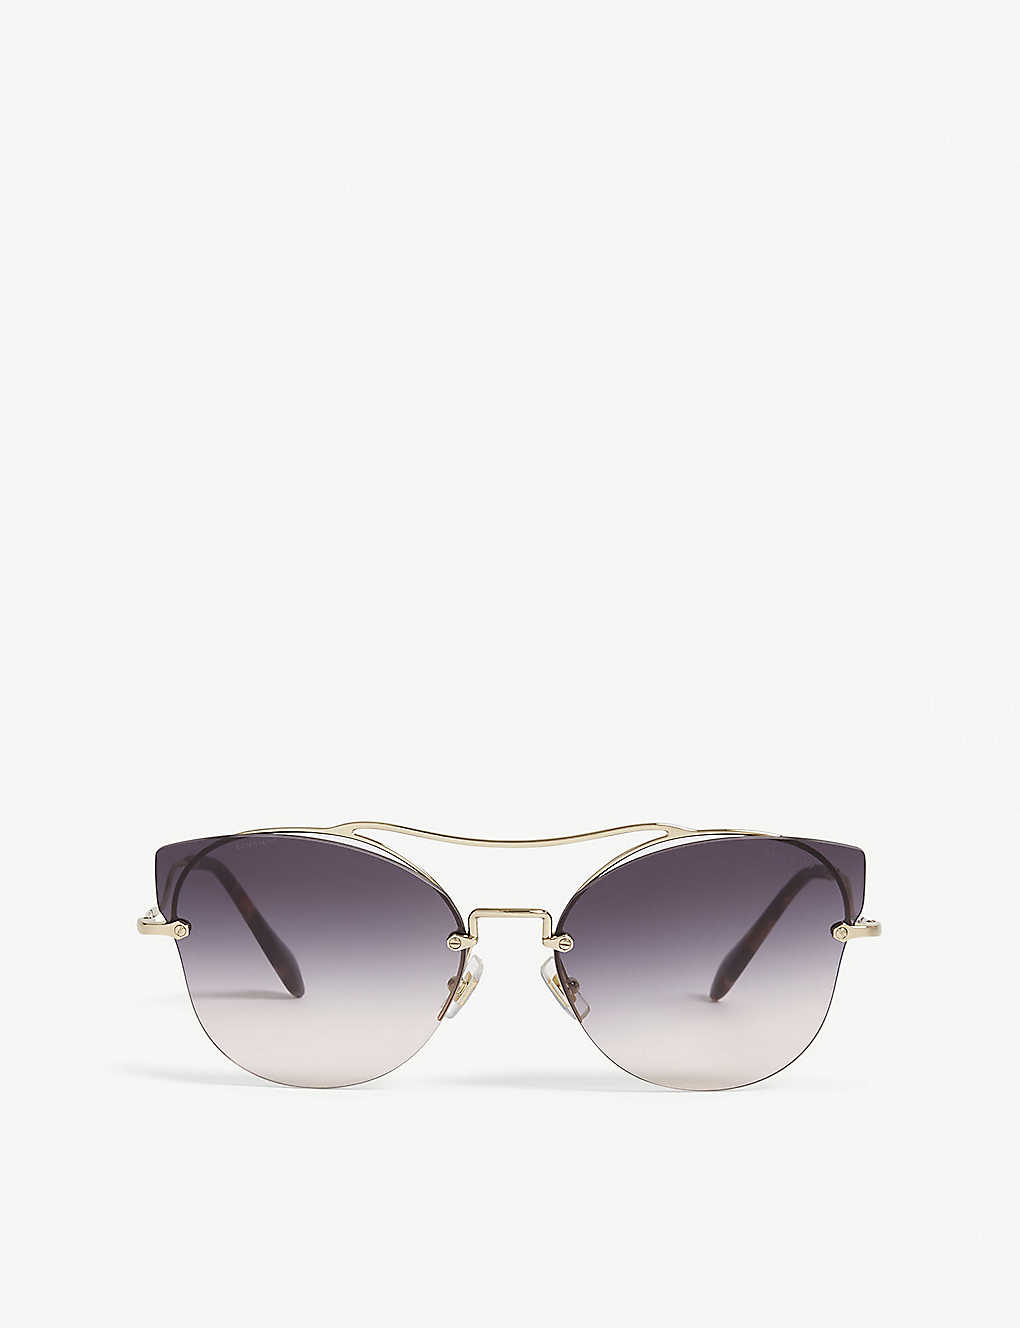 b6c94fcc991 MIU MIU - Mu52ss butterfly-frame sunglasses